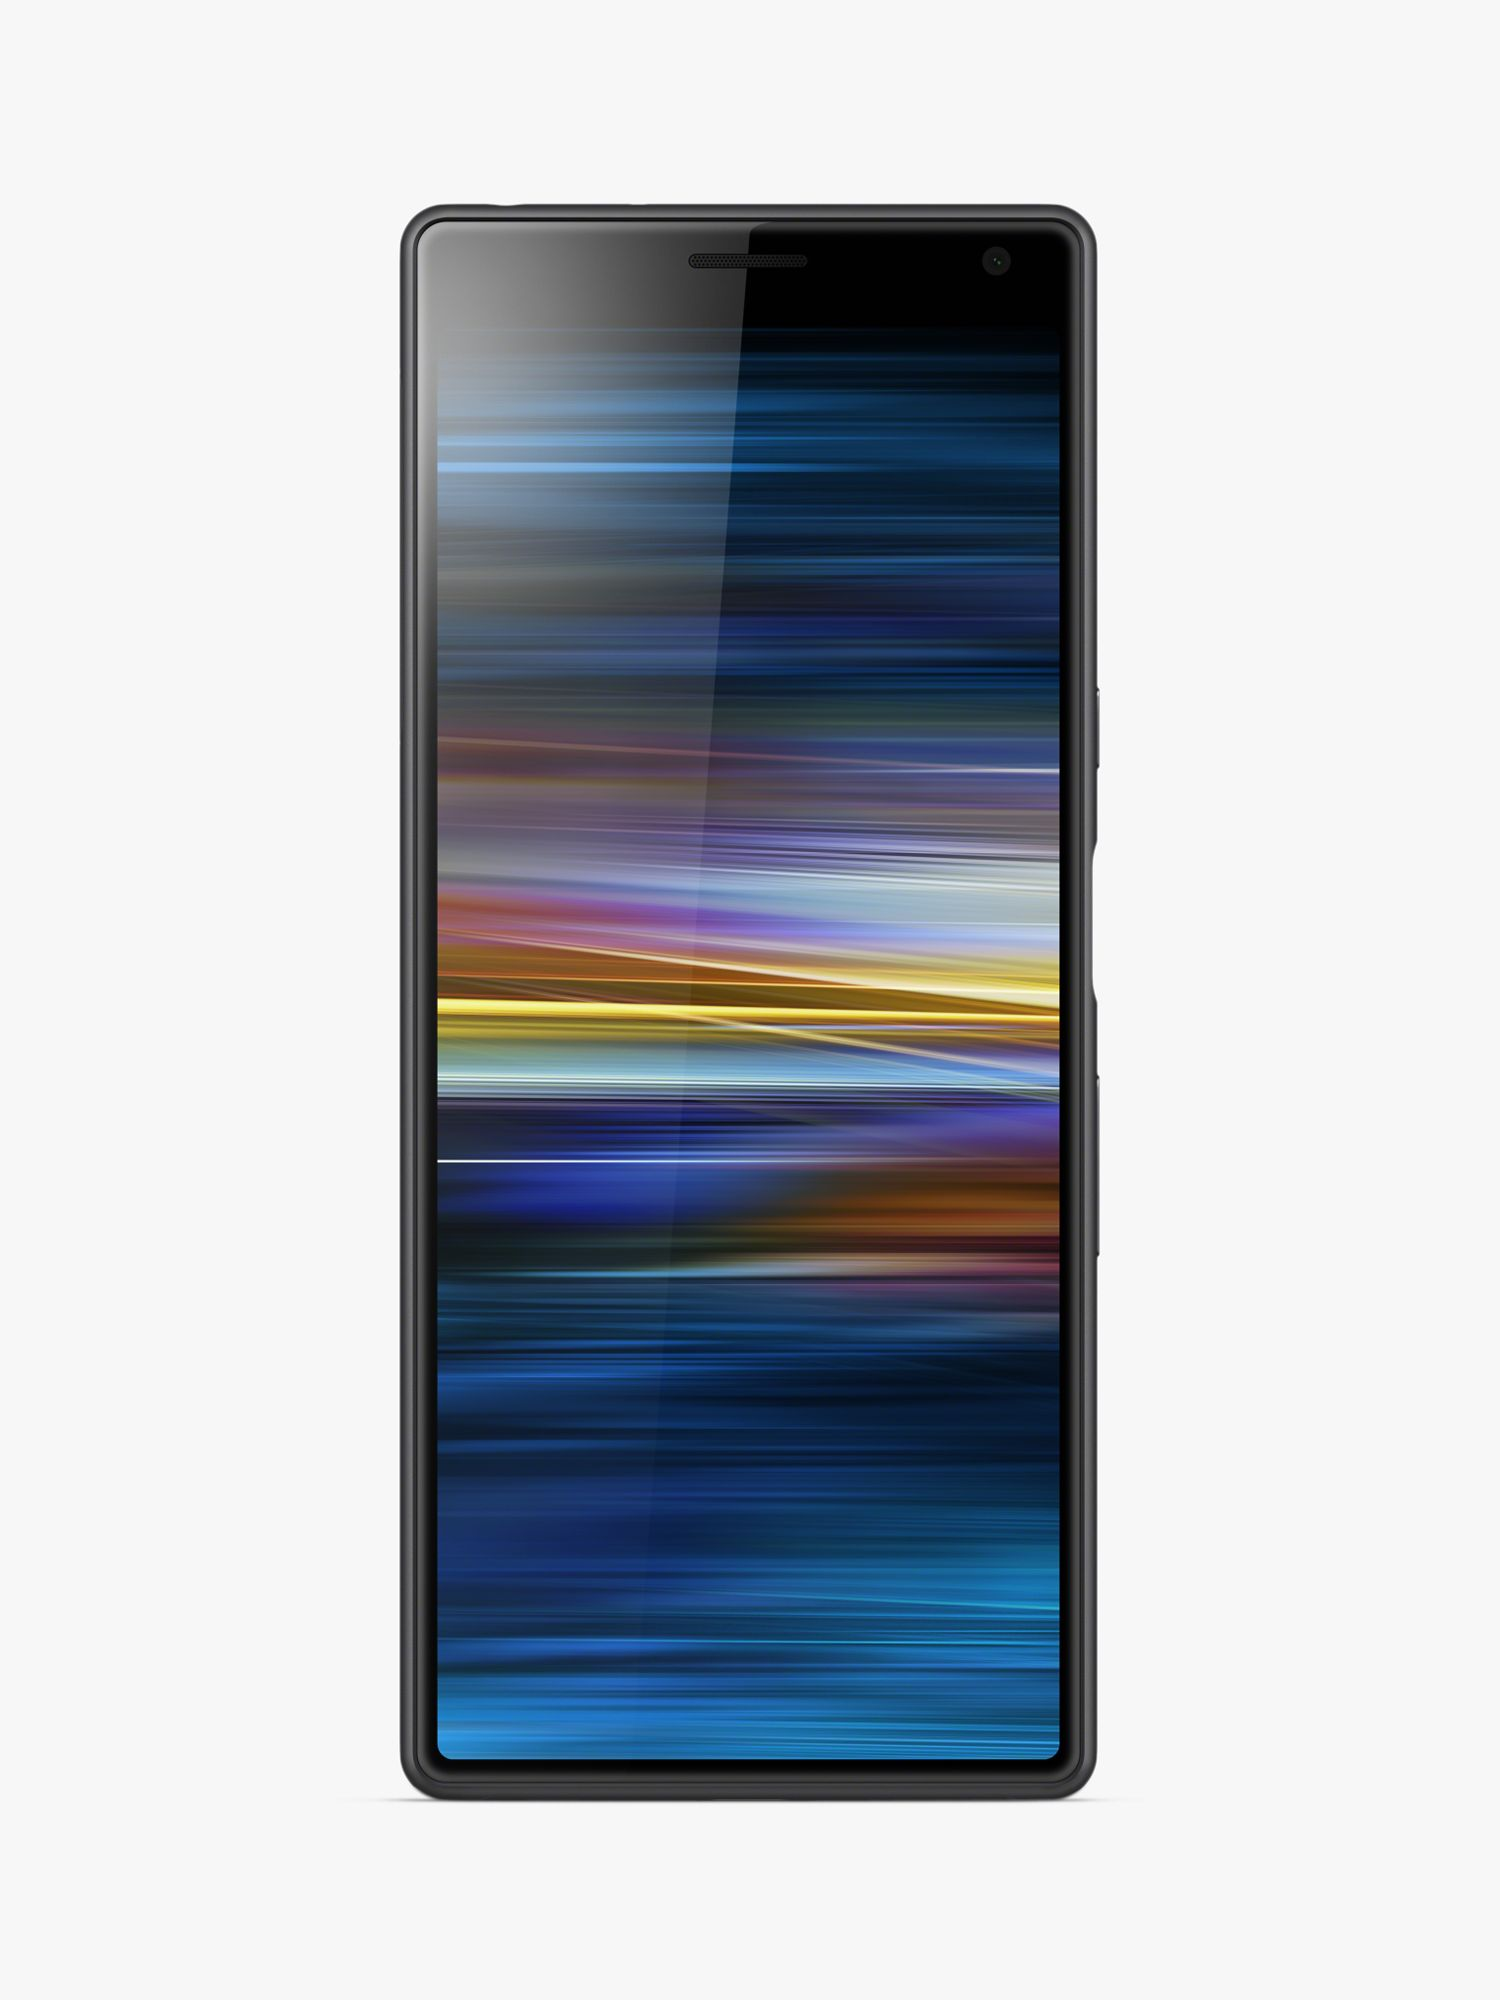 "Sony Sony Xperia 10 Smartphone, Android, 6"", 4G LTE, SIM Free, 3GB RAM, 64GB, Black"